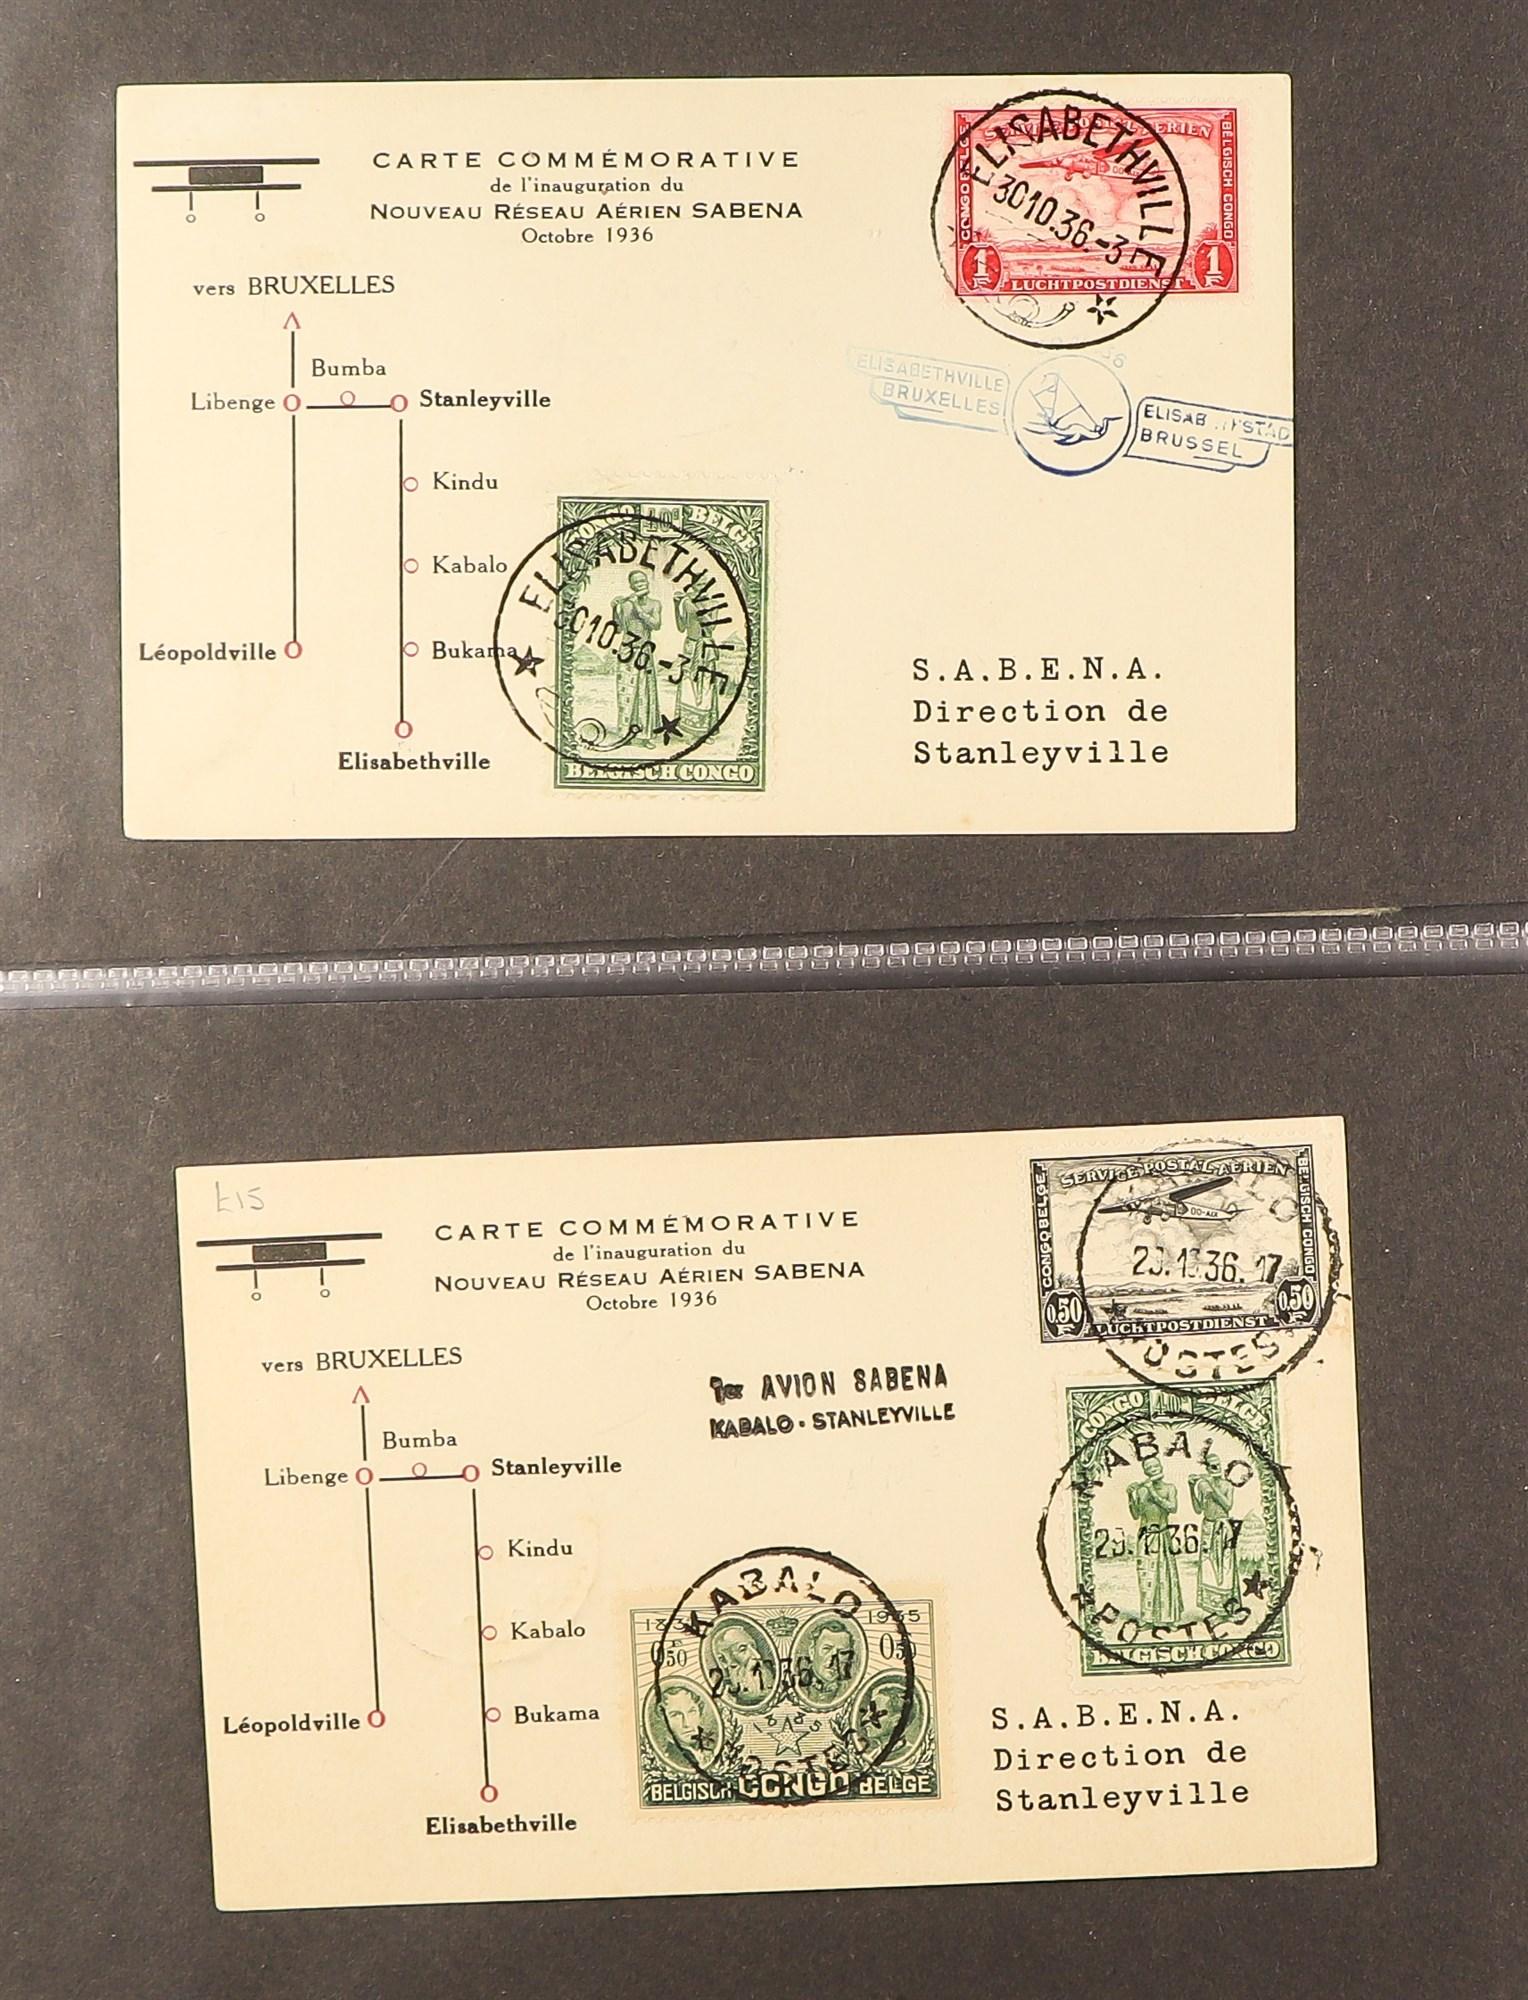 RHODESIA AIRMAIL COVERS COLLECTION 1930's-60's with Rhodesian & Nyasaland Airways (15), Nyasaland- - Image 9 of 10